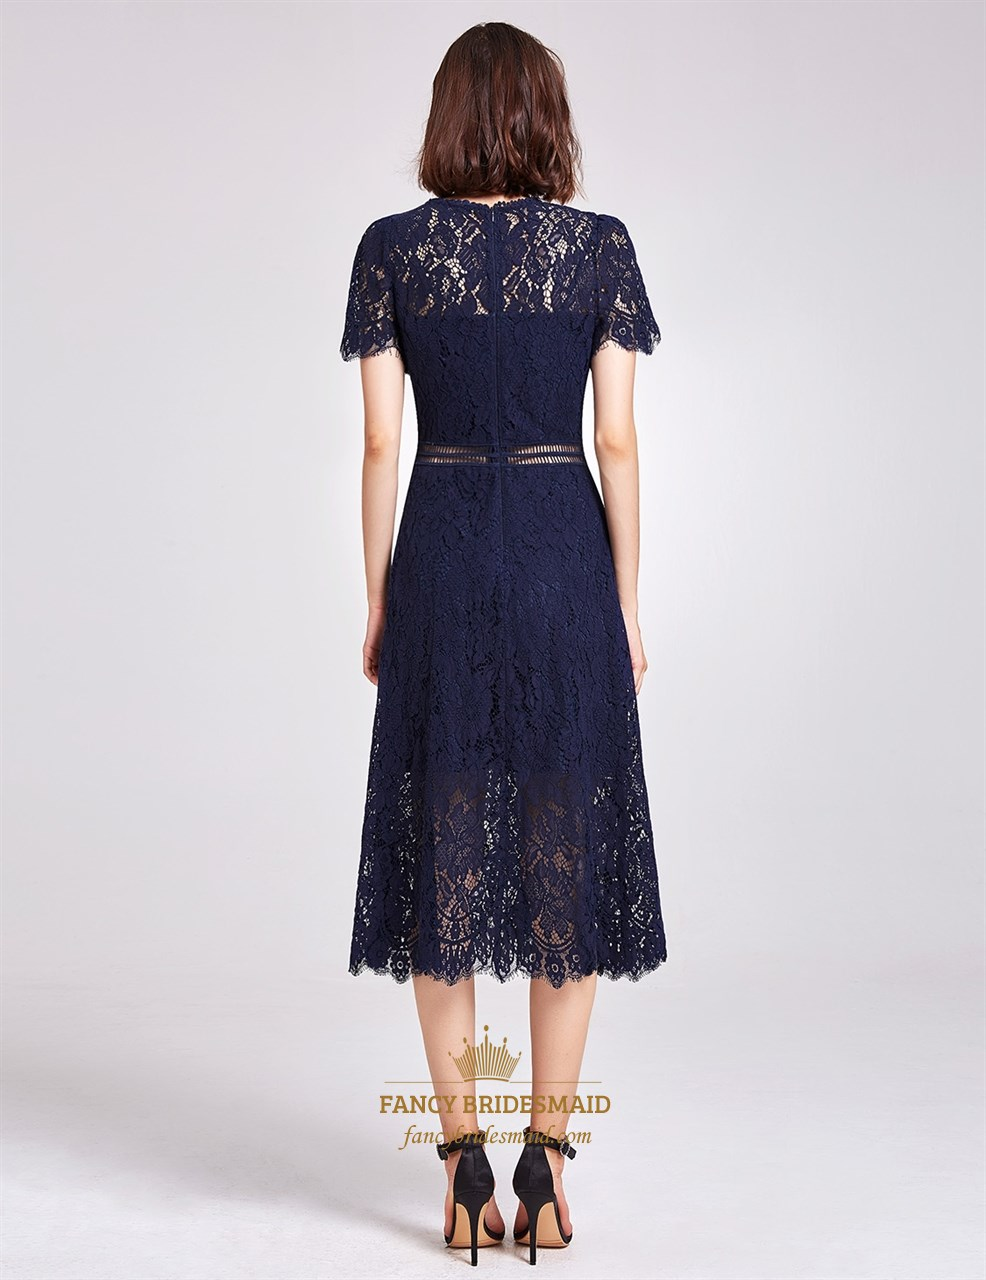 Elegant Navy Blue Short Sleeve A Line Tea Length Lace